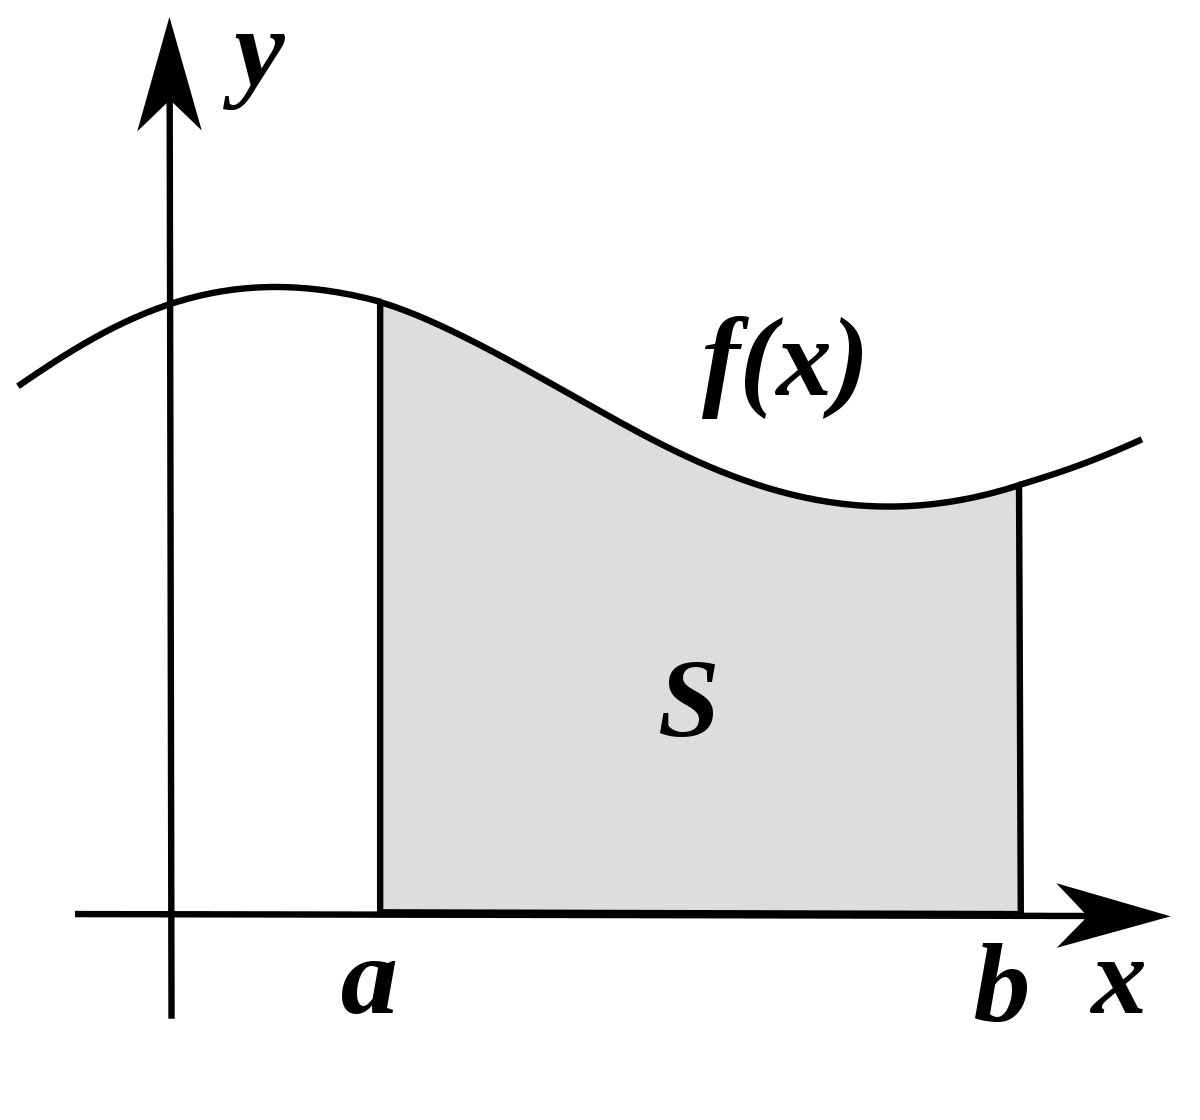 Integralrechnung Wikipedia